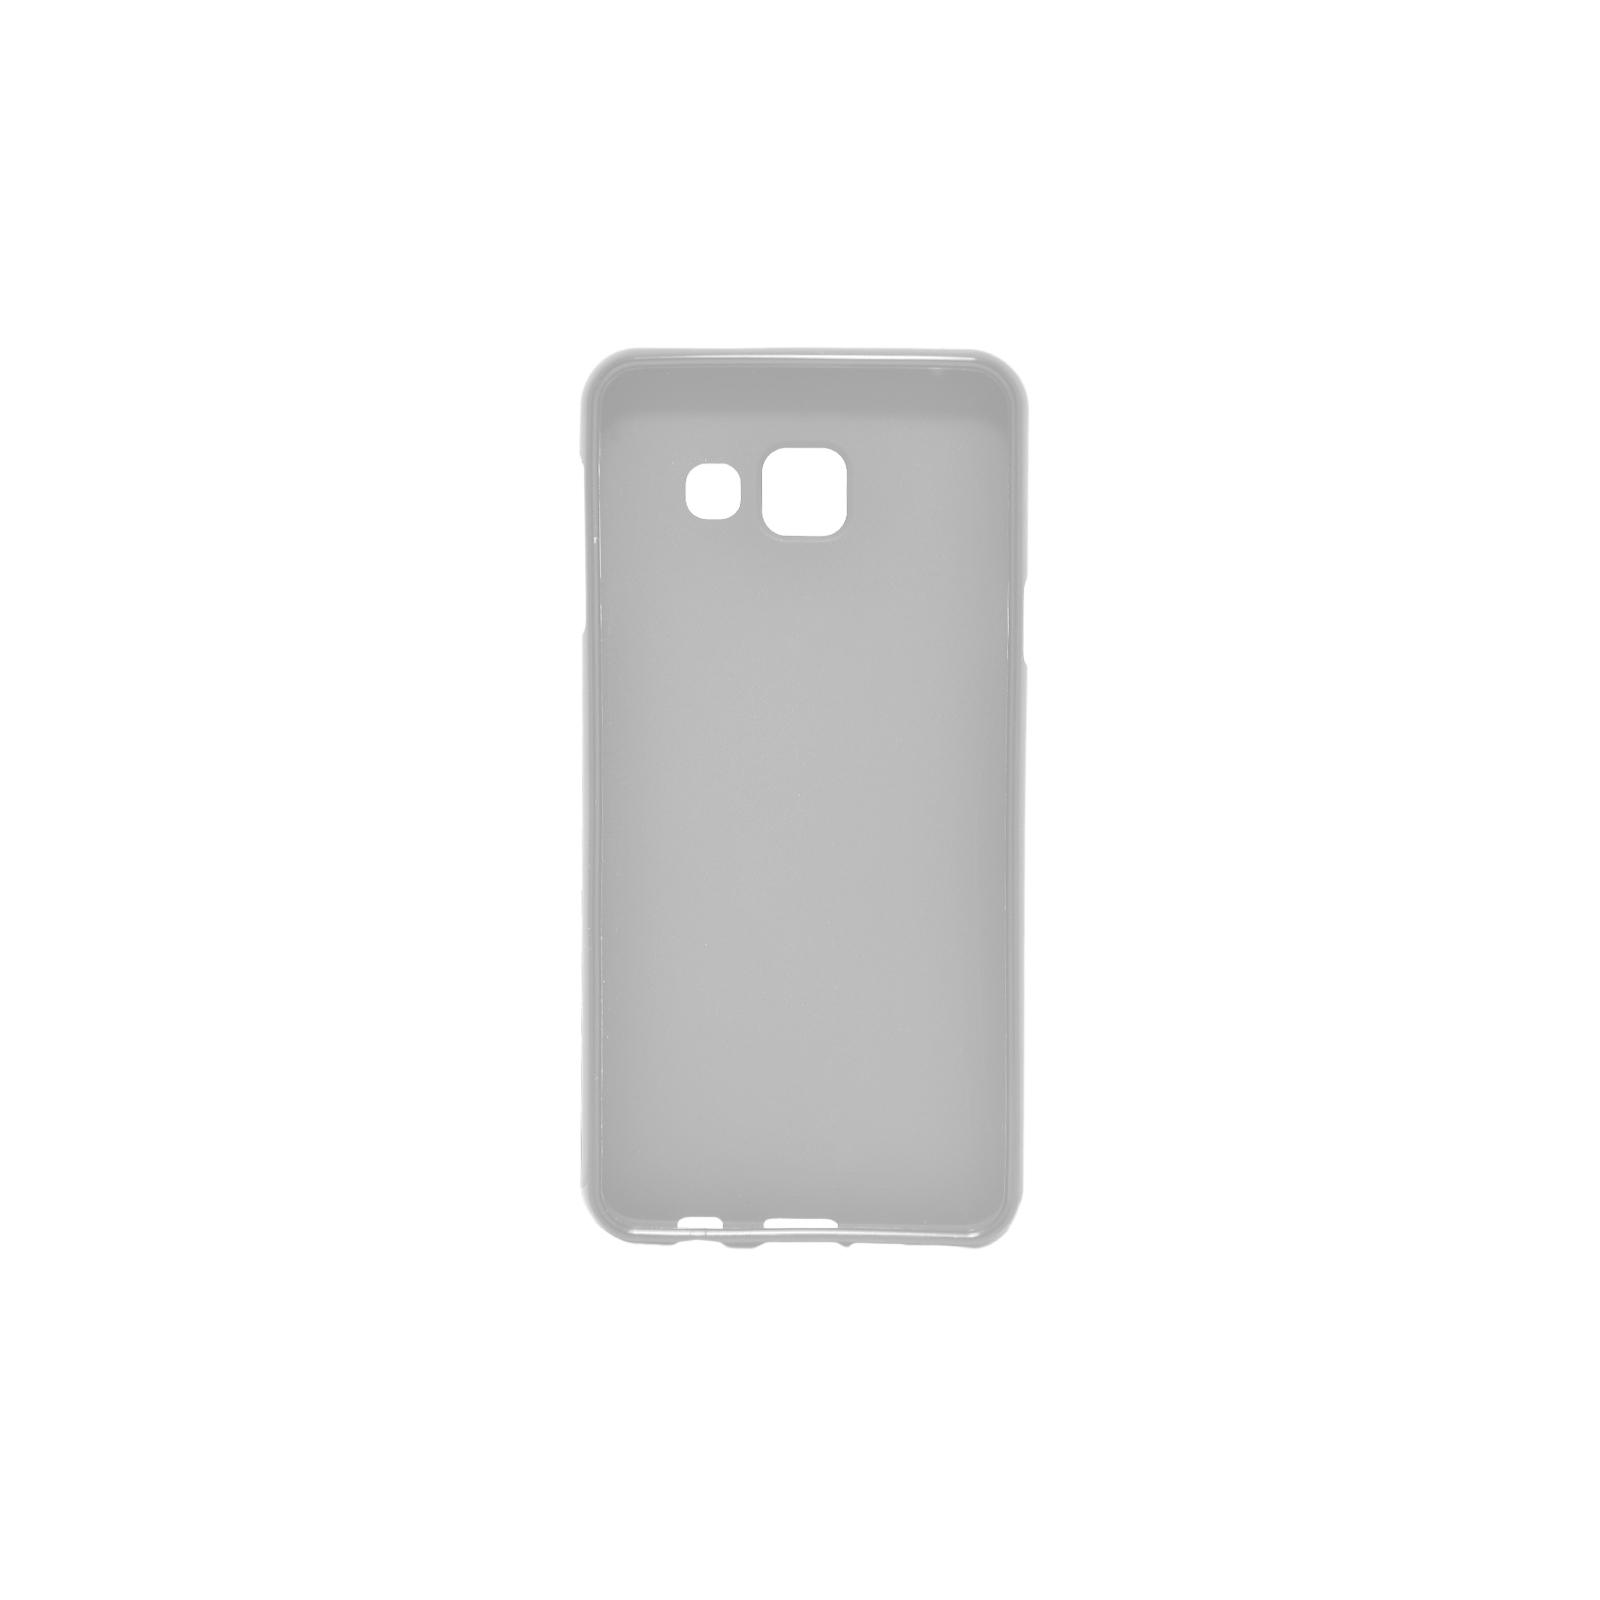 Чехол для моб. телефона Pro-case для Samsung Galaxy A5 (A510) White (CP-306-WHT) (CP-306-WHT)